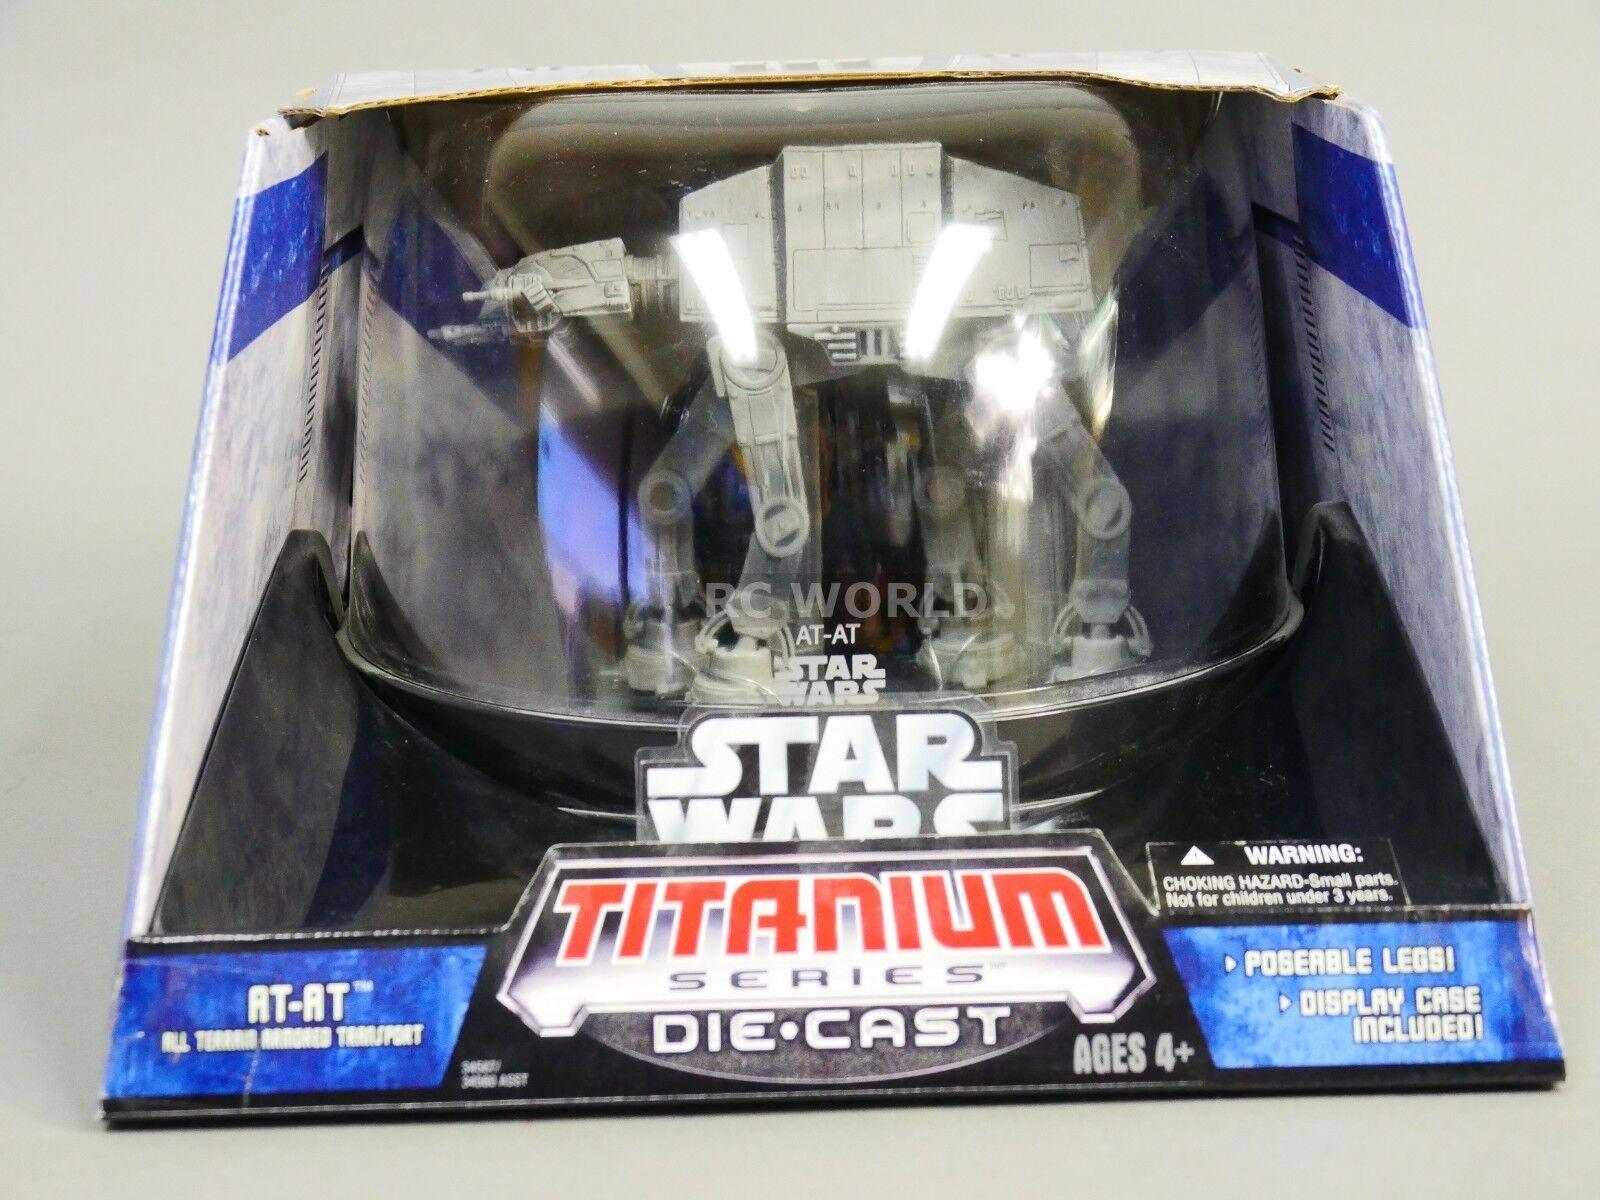 Star Wars Titanium Series AT-AT Transport Die-Cast Model  ob1